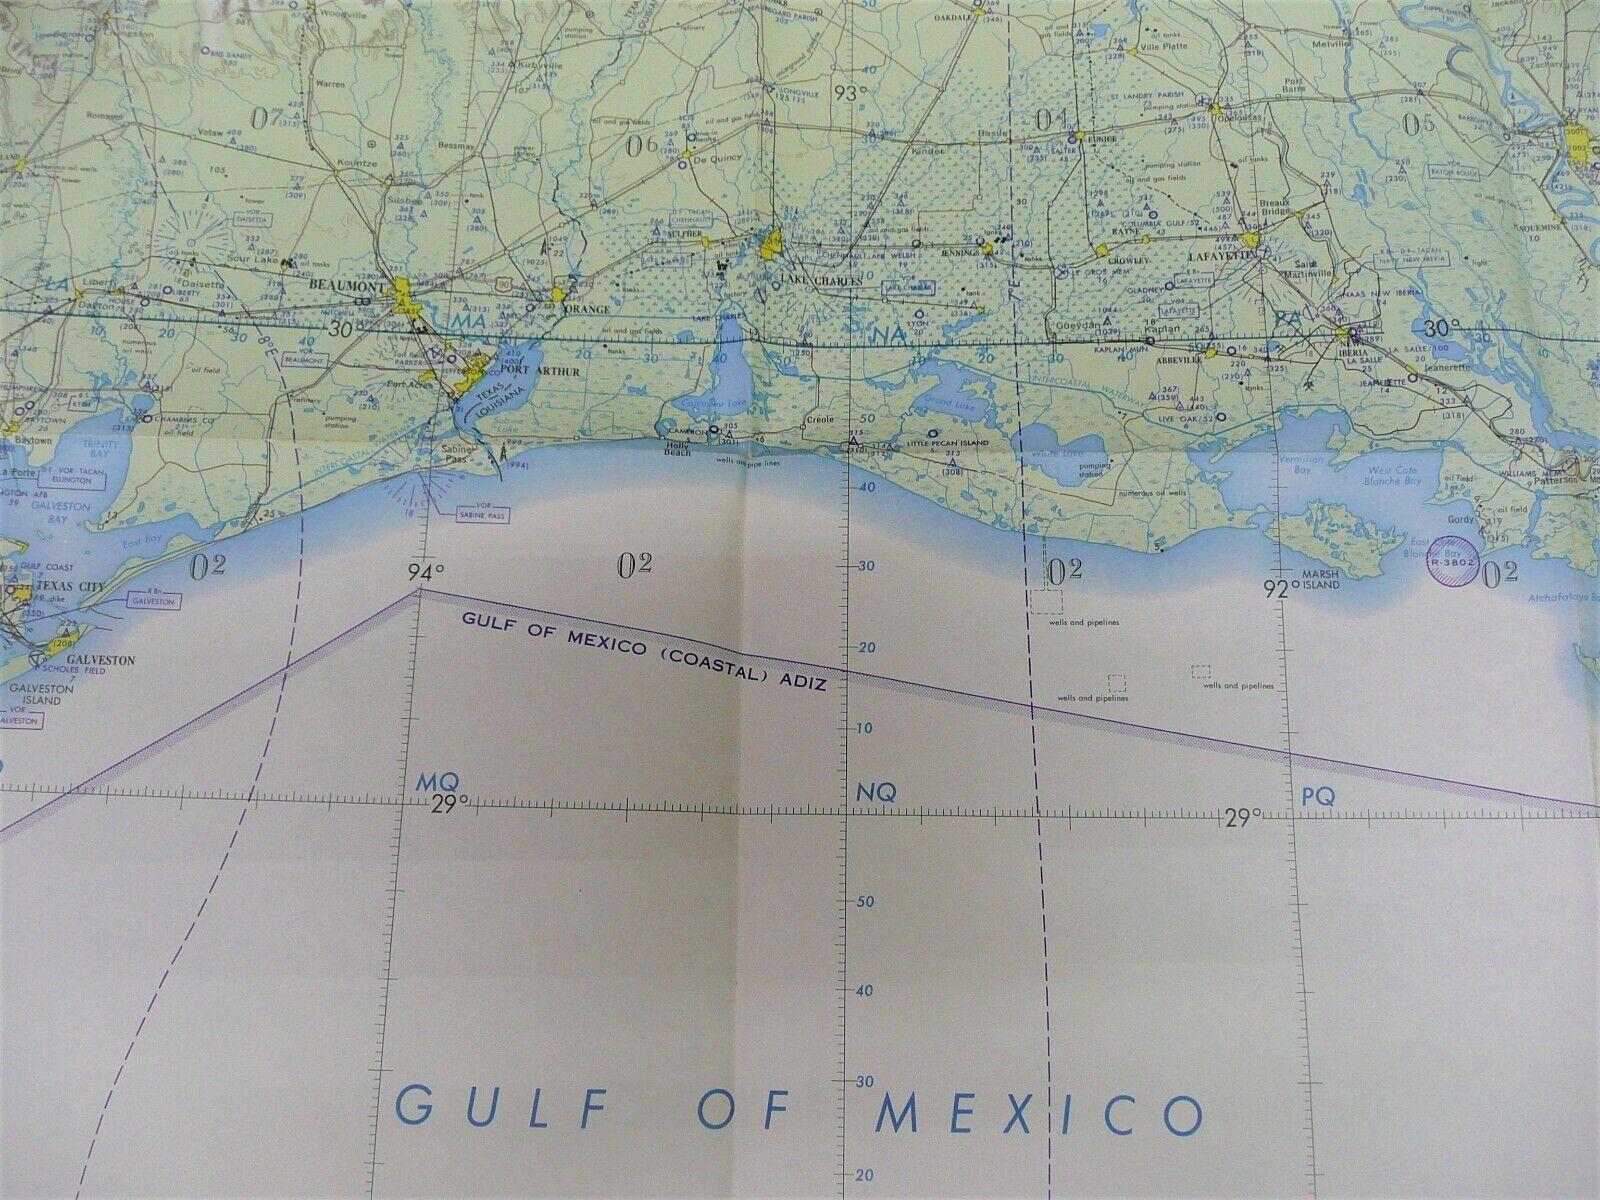 '63 USAF Navigation Chart Galveston Bay Texas New Orleans Aeronautical Sectional